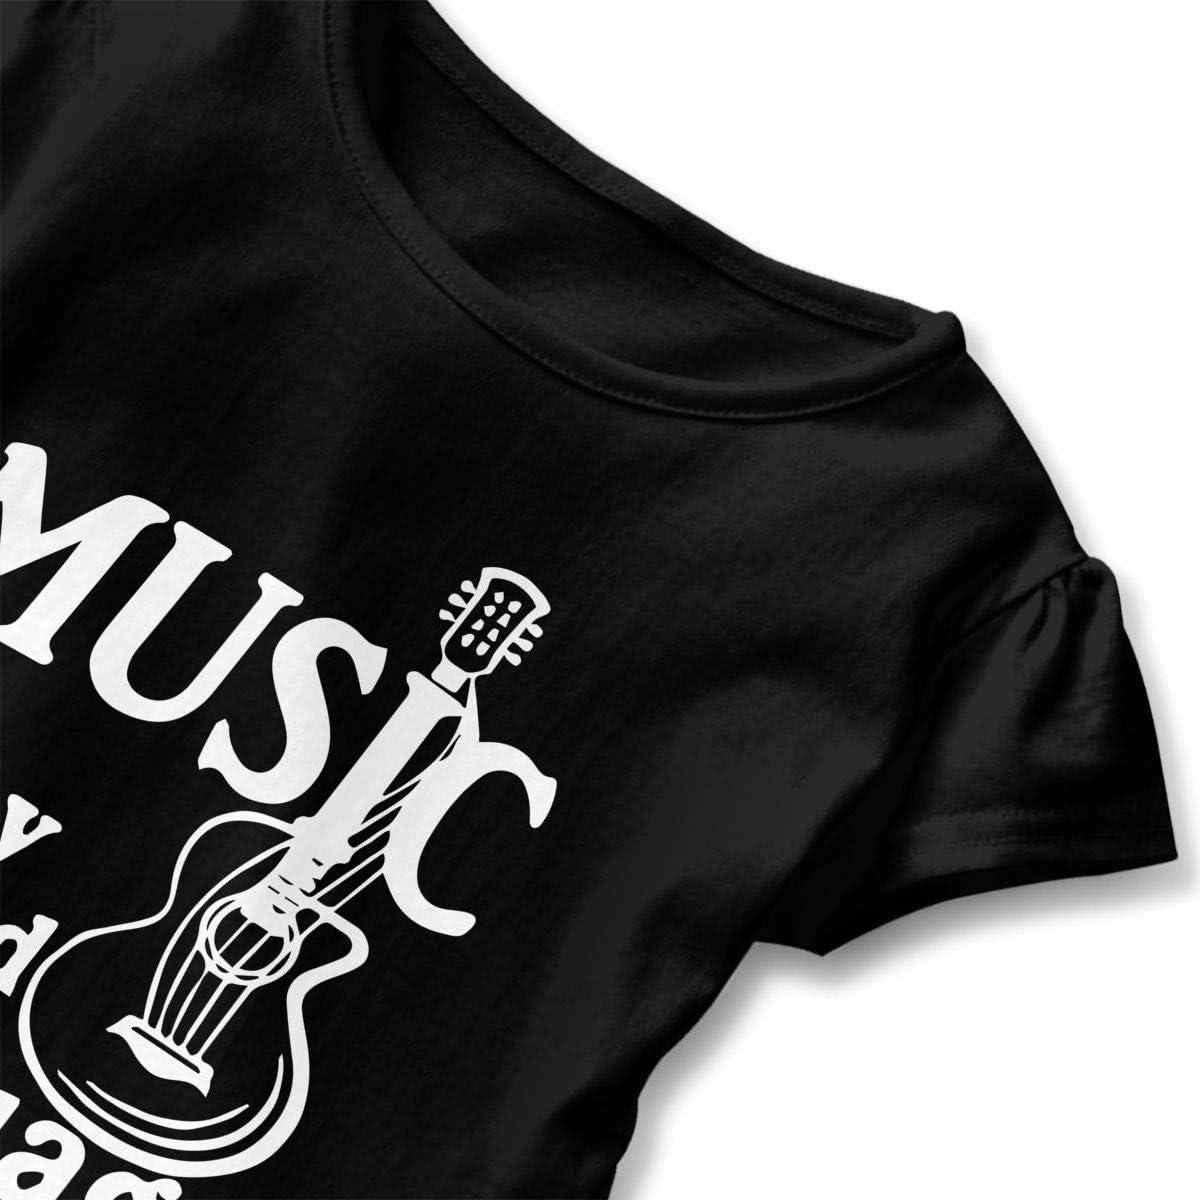 Cheng Jian Bo Music is My Second Language Guitar Toddler Girls T Shirt Kids Cotton Short Sleeve Ruffle Tee